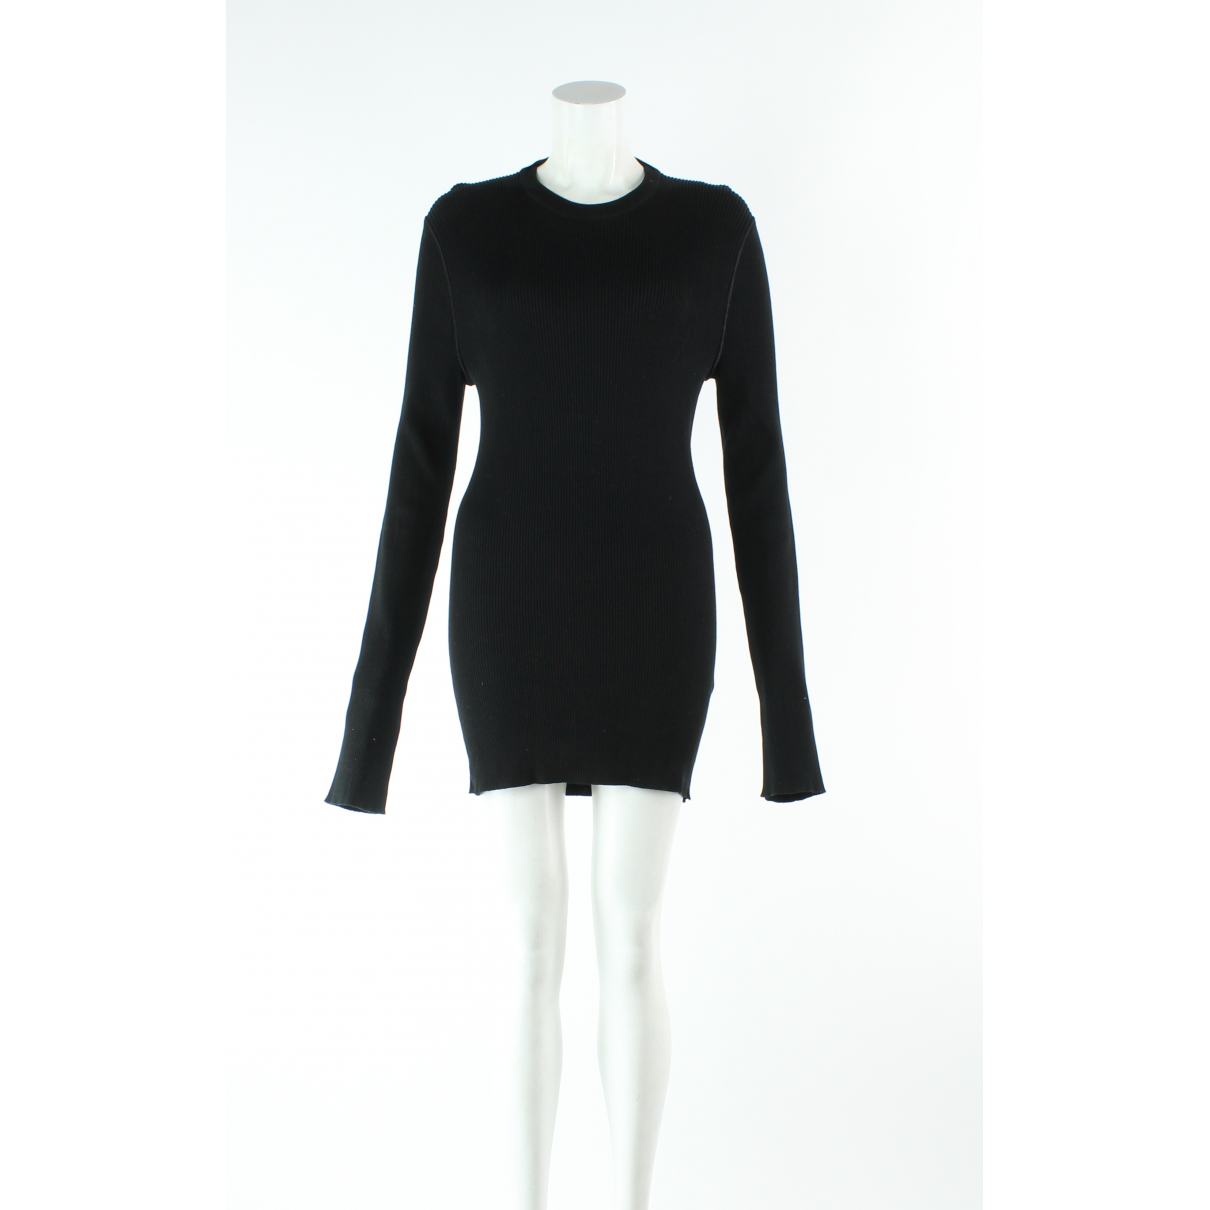 Dolce & Gabbana \N Black Cotton dress for Women 54-56 IT